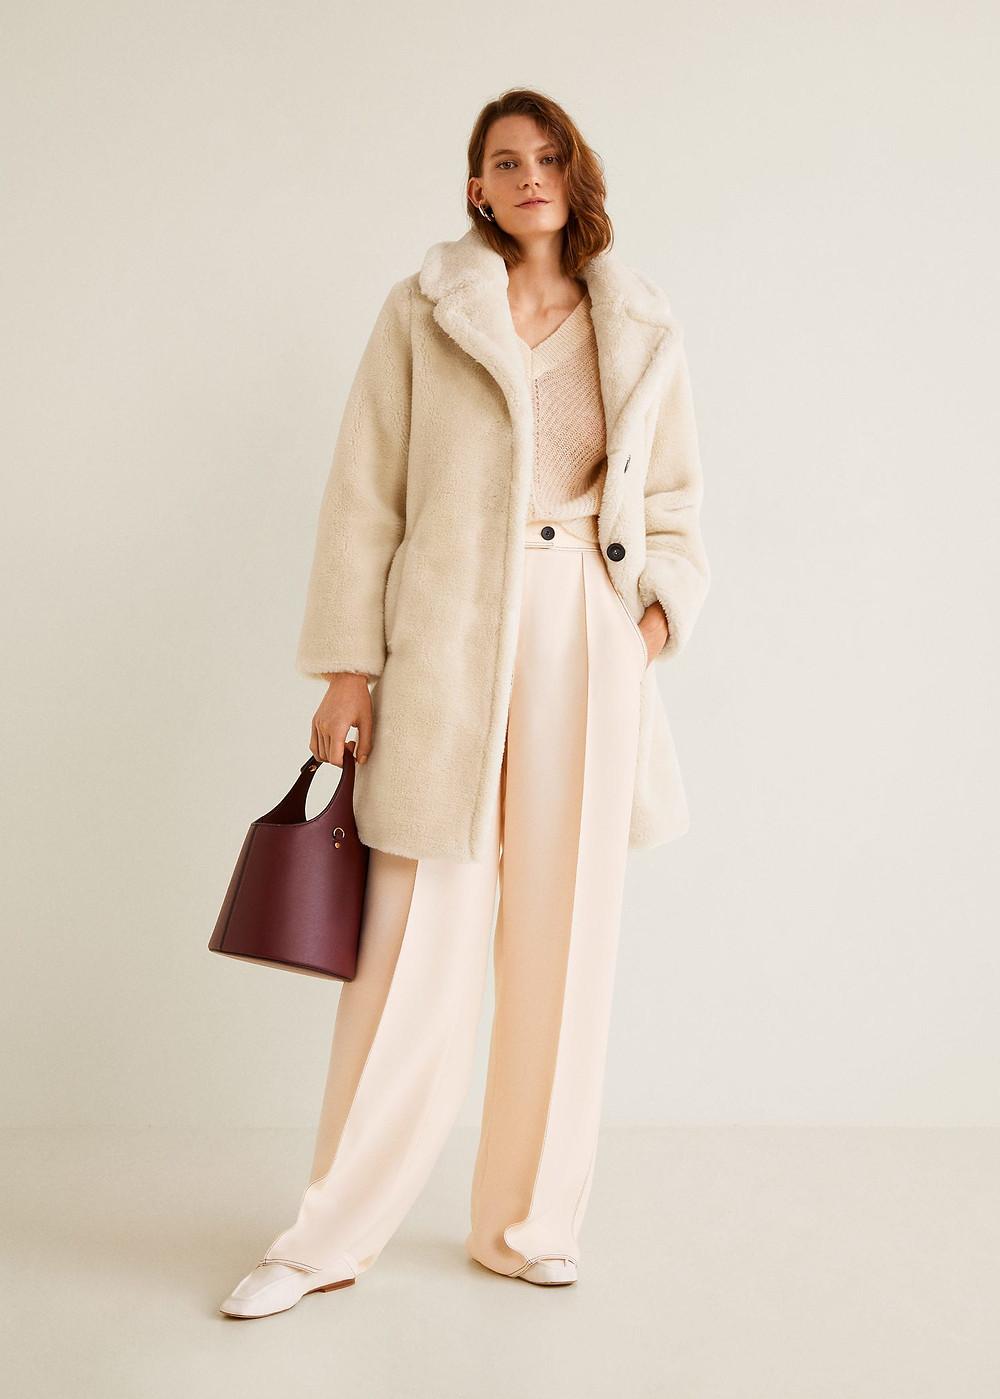 Mango Lapels faux fur coat $119.99